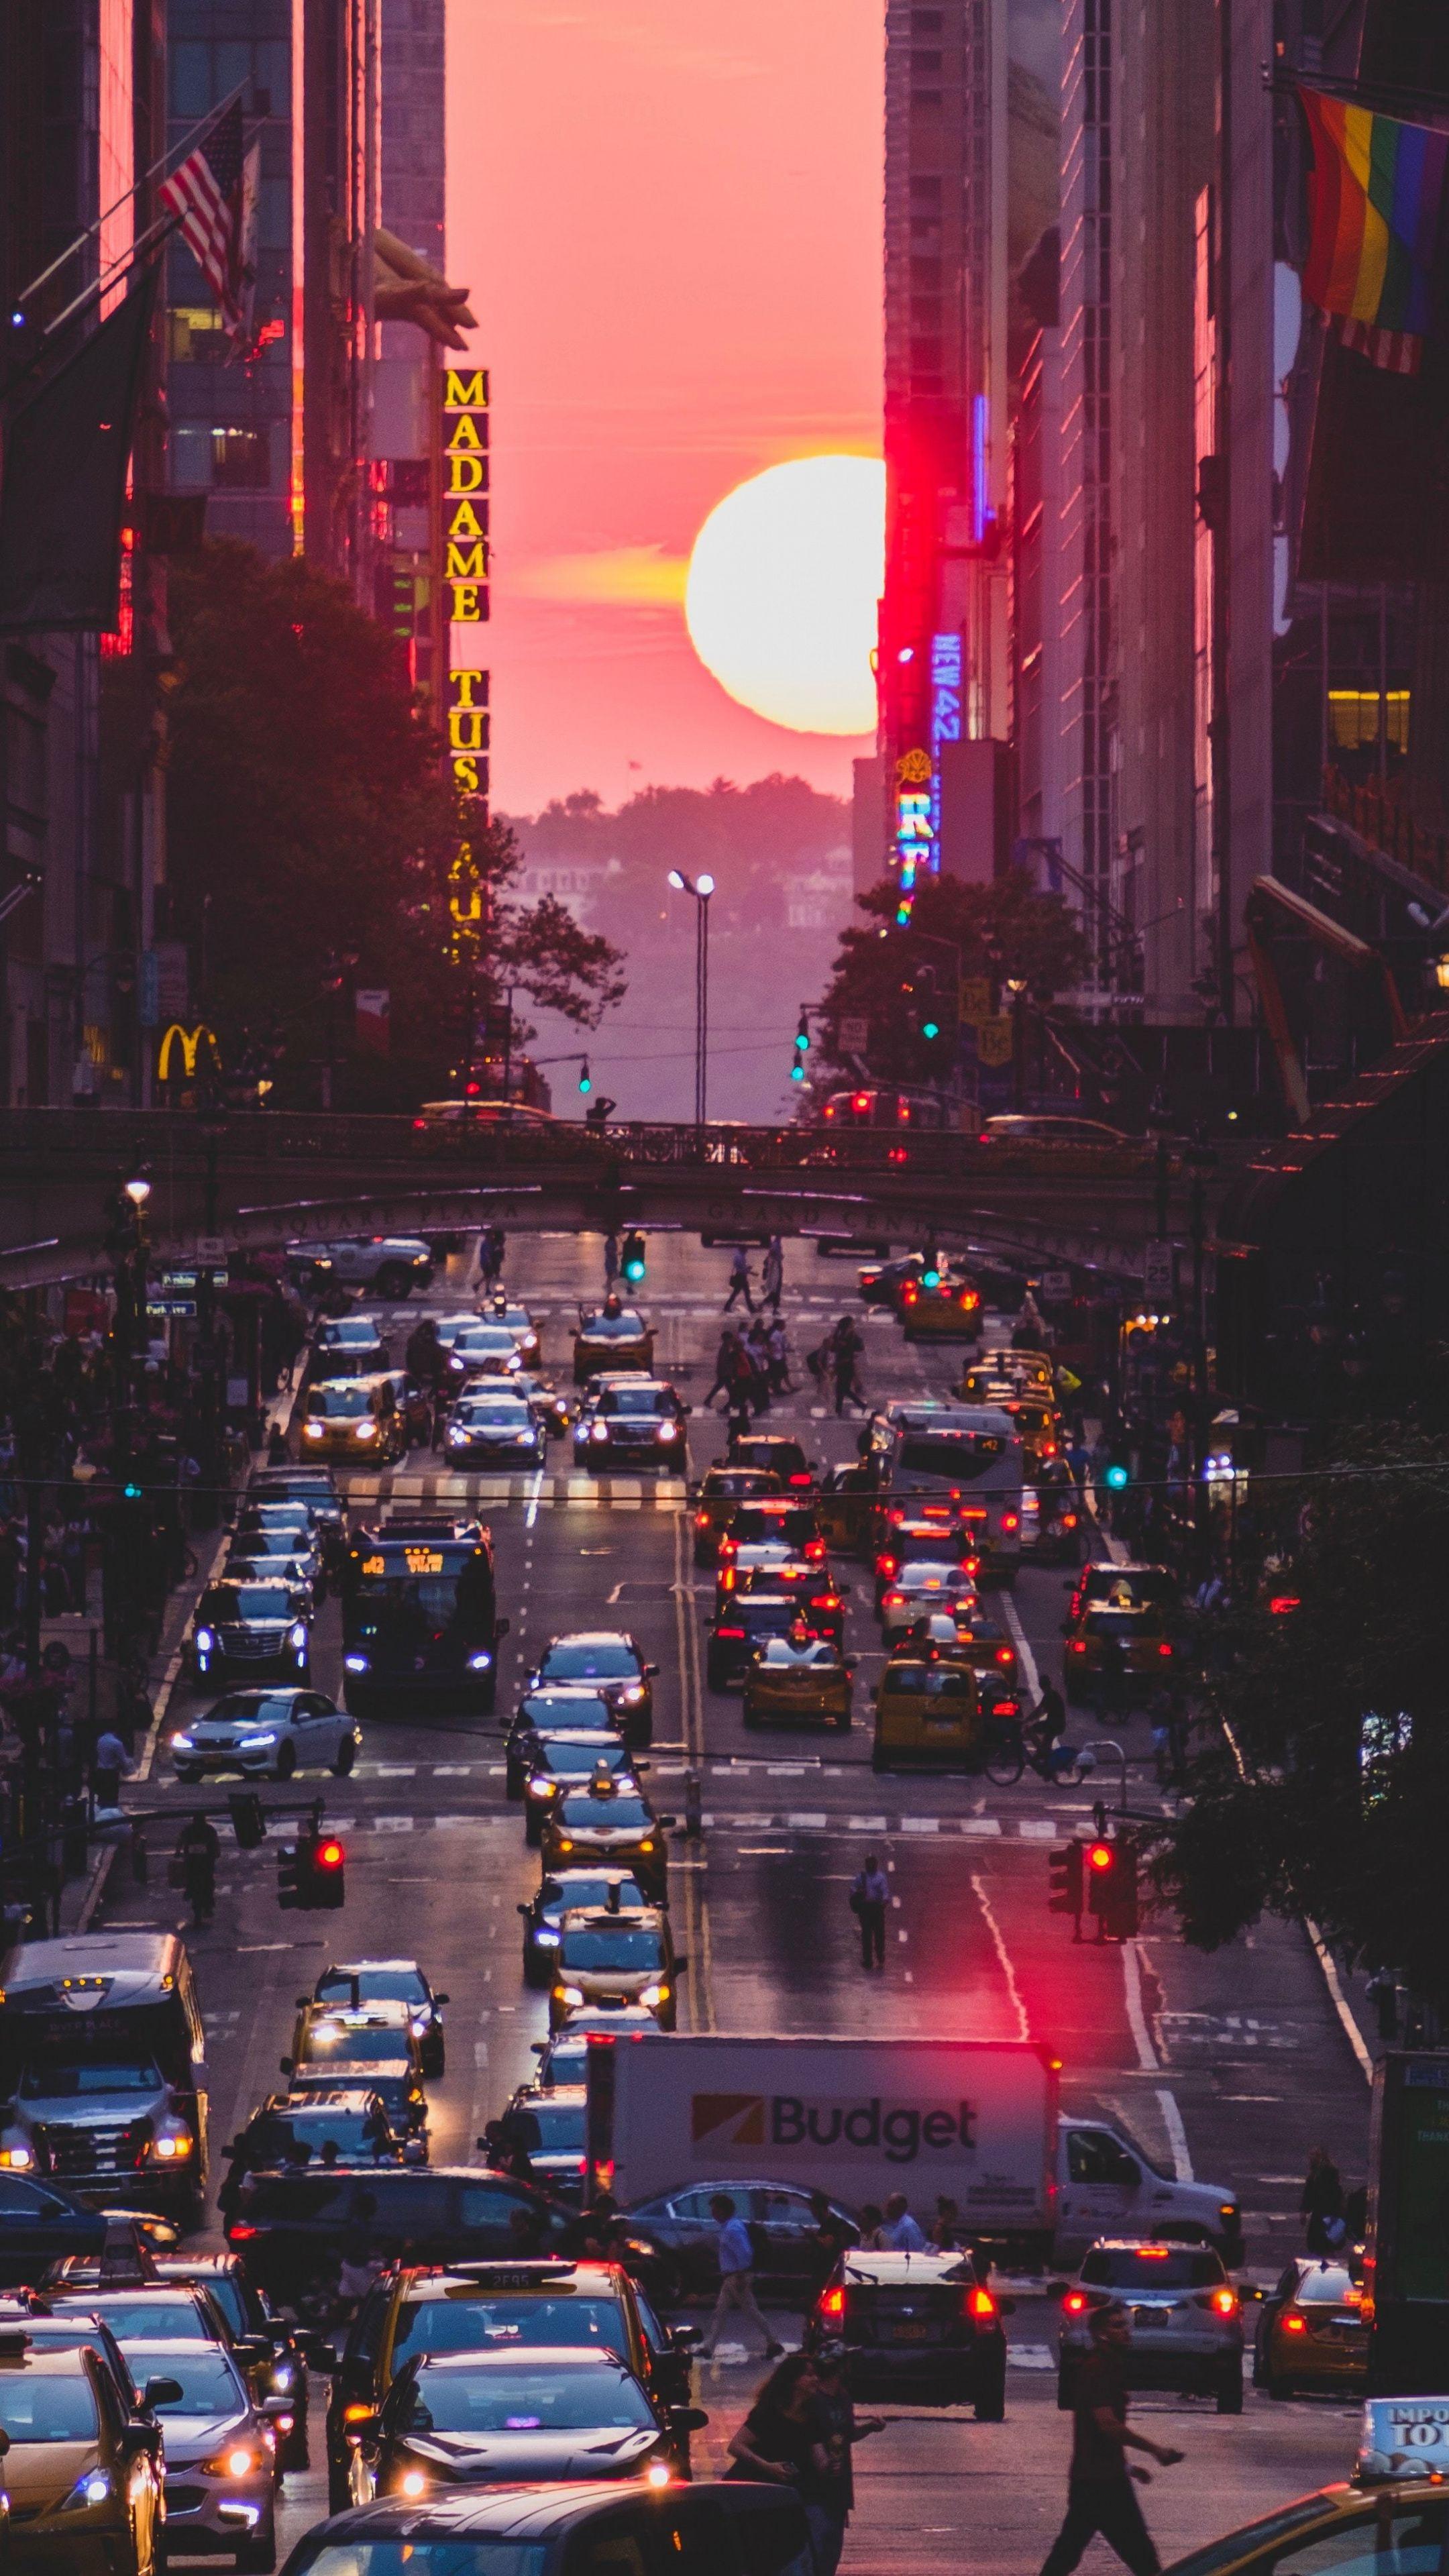 2160x3840 Sunset Metropolis City Buildings Wallpaper Sunset City City Wallpaper Sunset Wallpaper